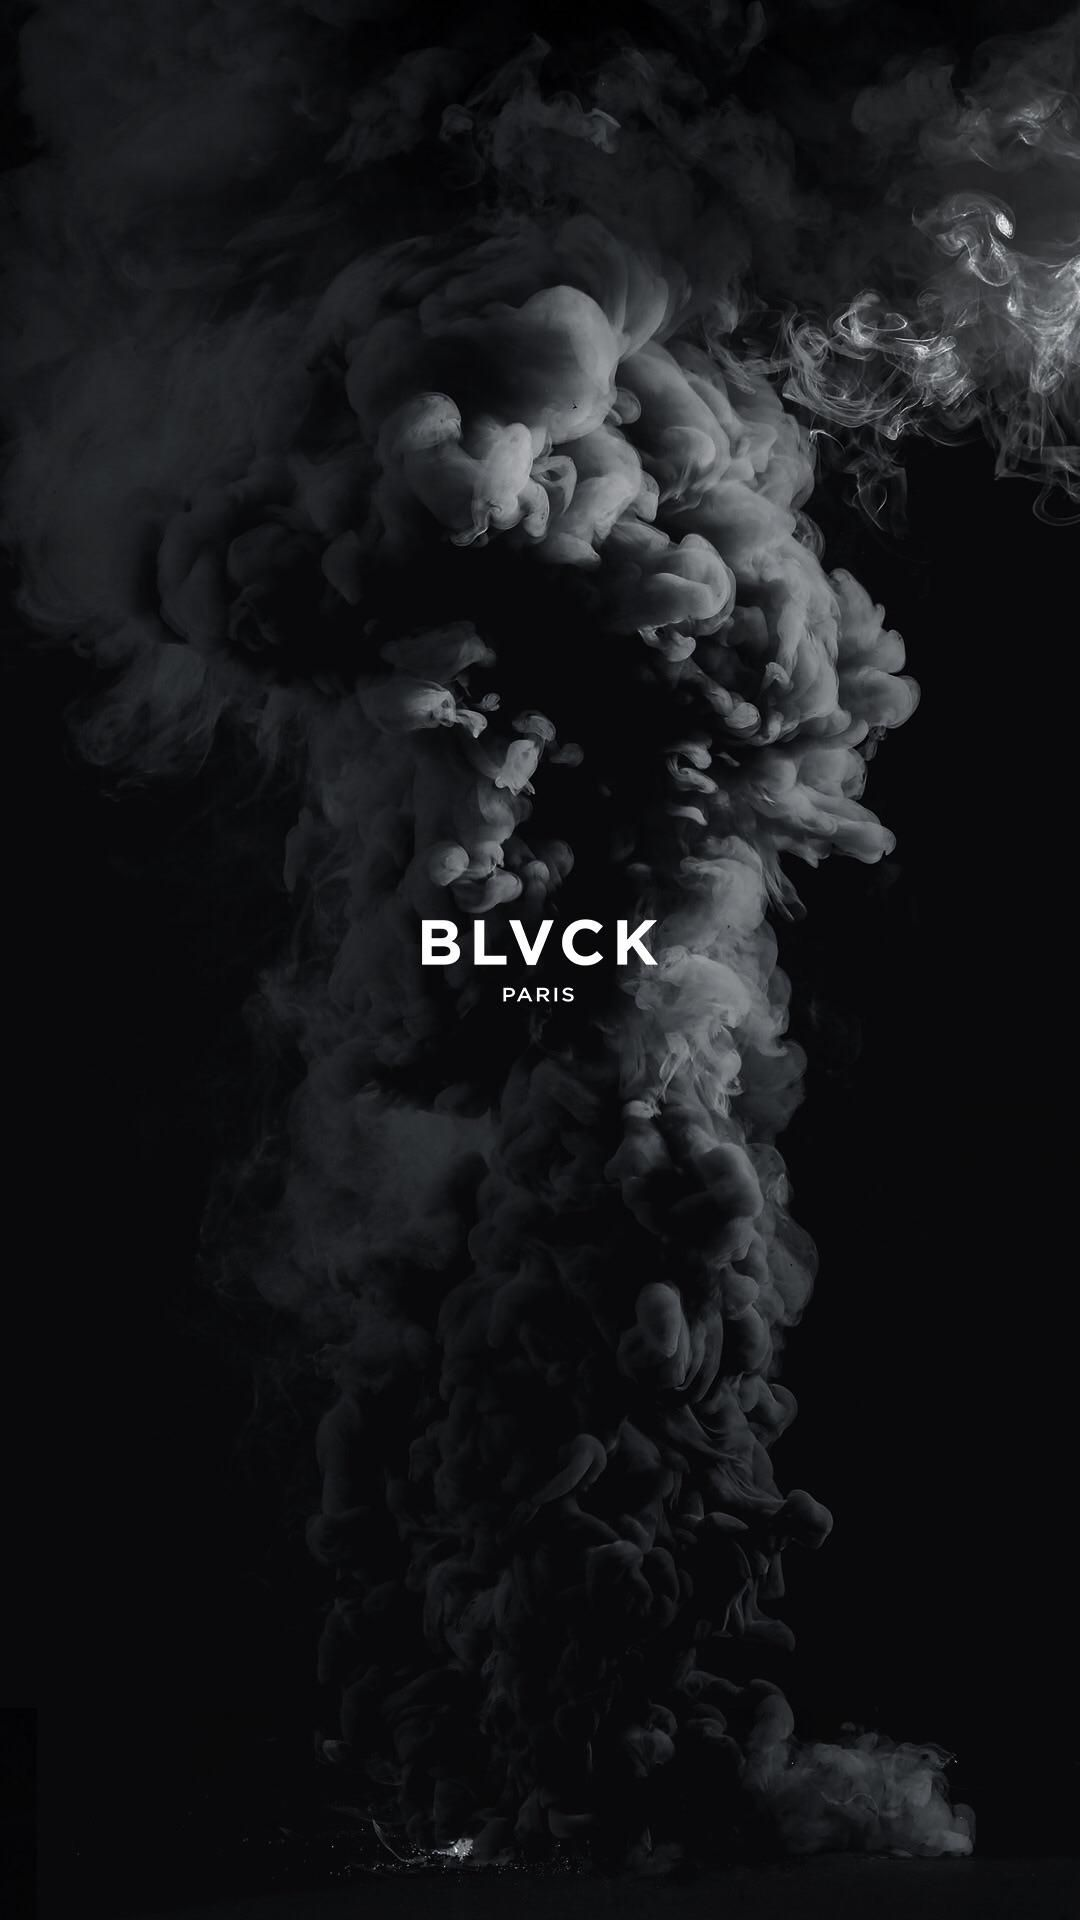 Blvck壁紙iphone オールブラックのiphone壁紙 1080x19 Wallpapertip